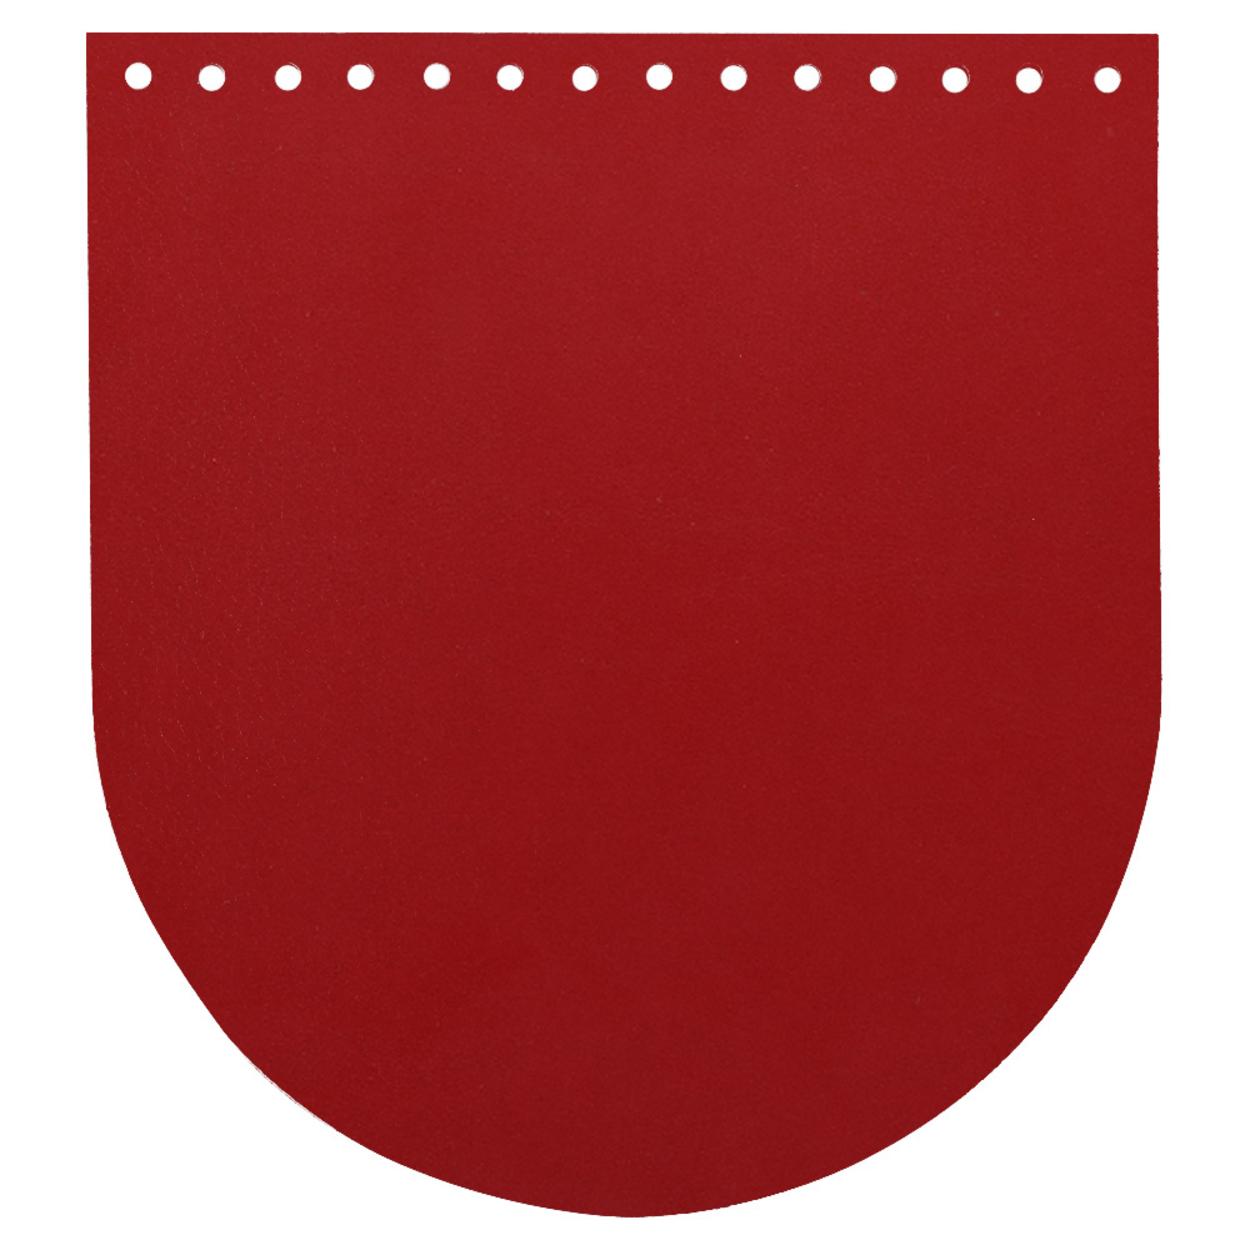 Кожа - Крышка-клапан овал 20 х 22 см. Red hot